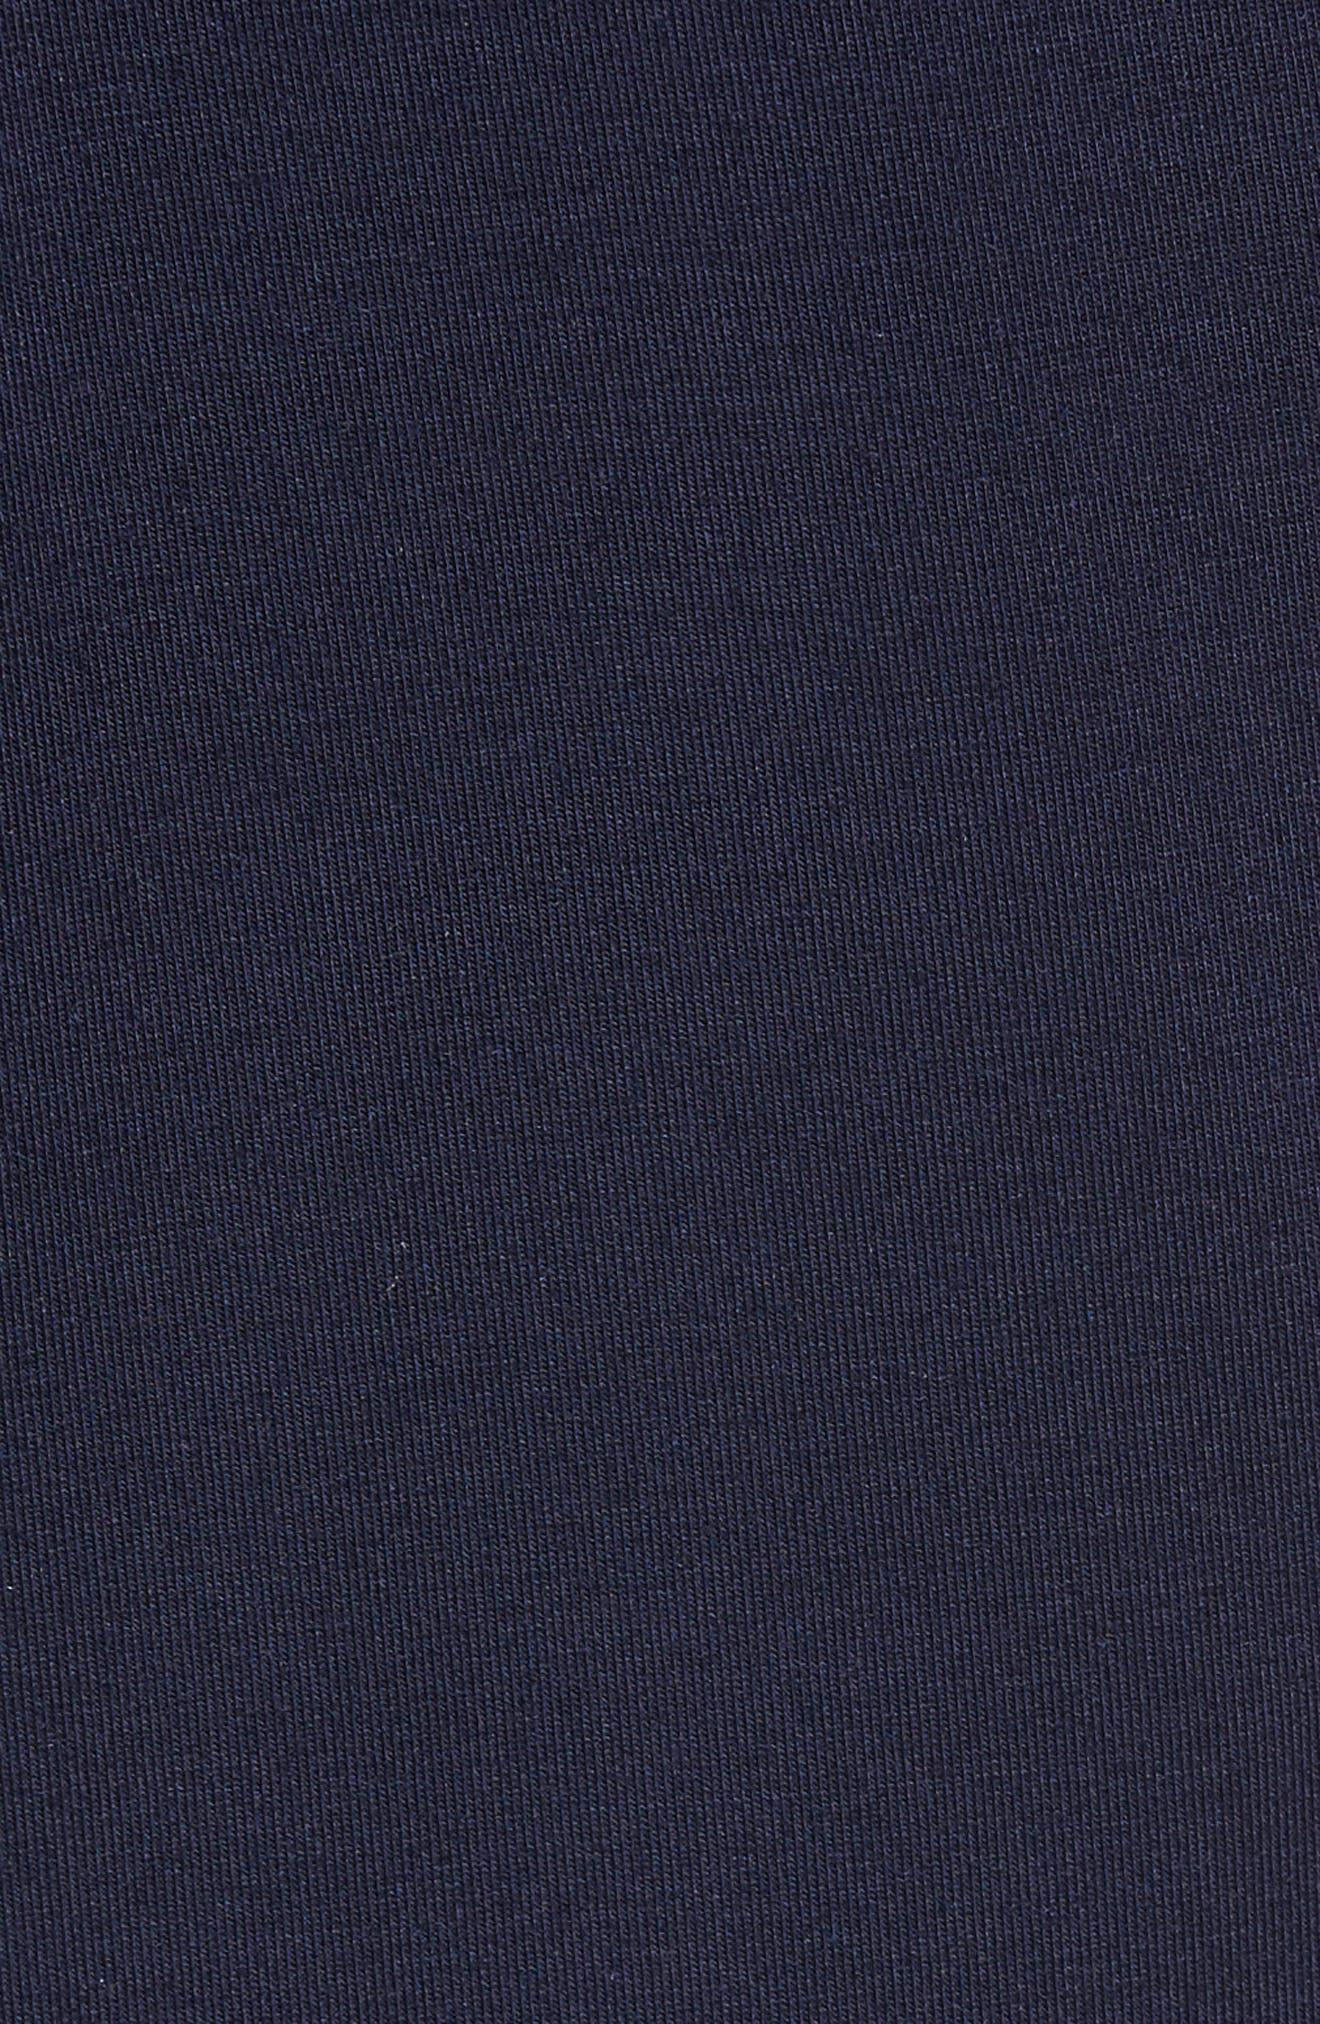 Modal & Silk Lounge Pants,                             Alternate thumbnail 5, color,                             Ink